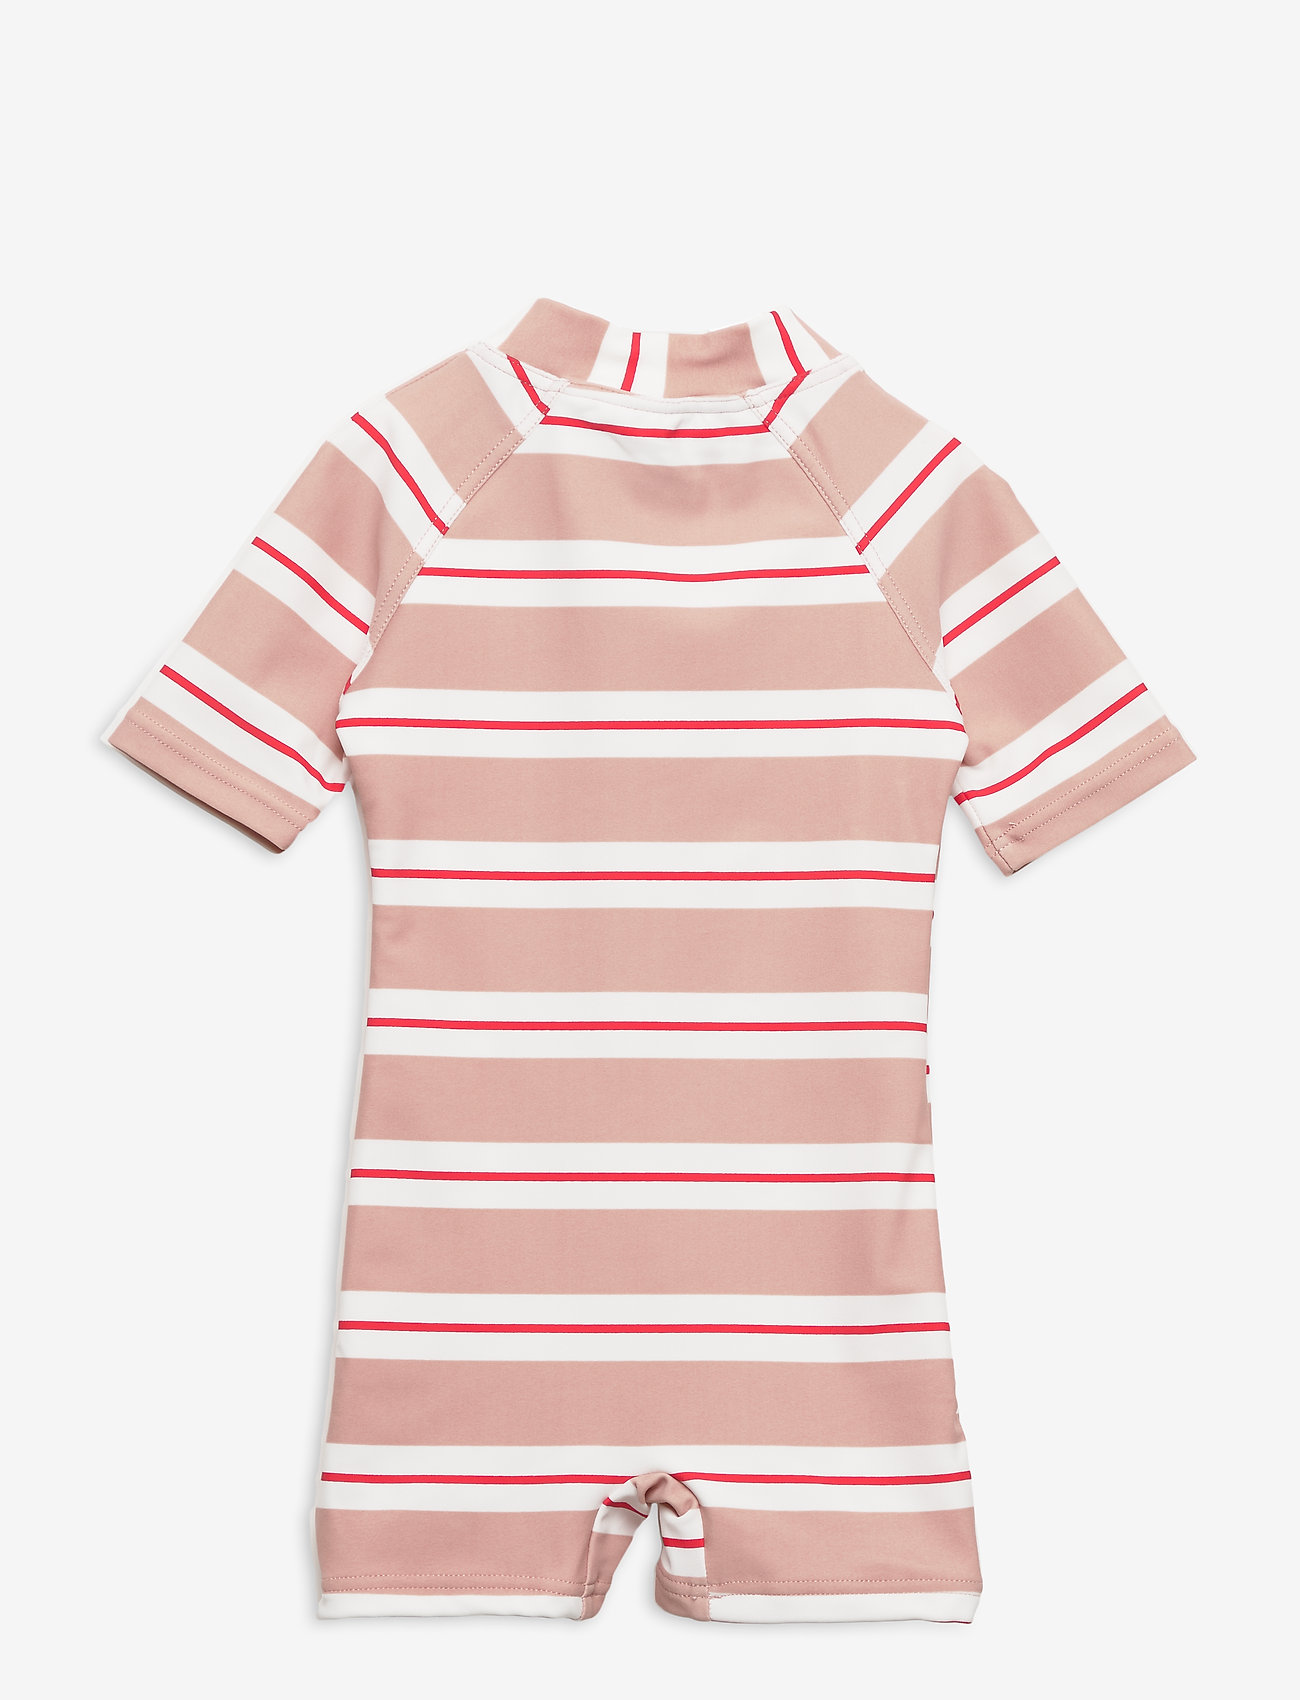 Liewood - Max Swim jumpsuit - swimsuits - stripe - 1